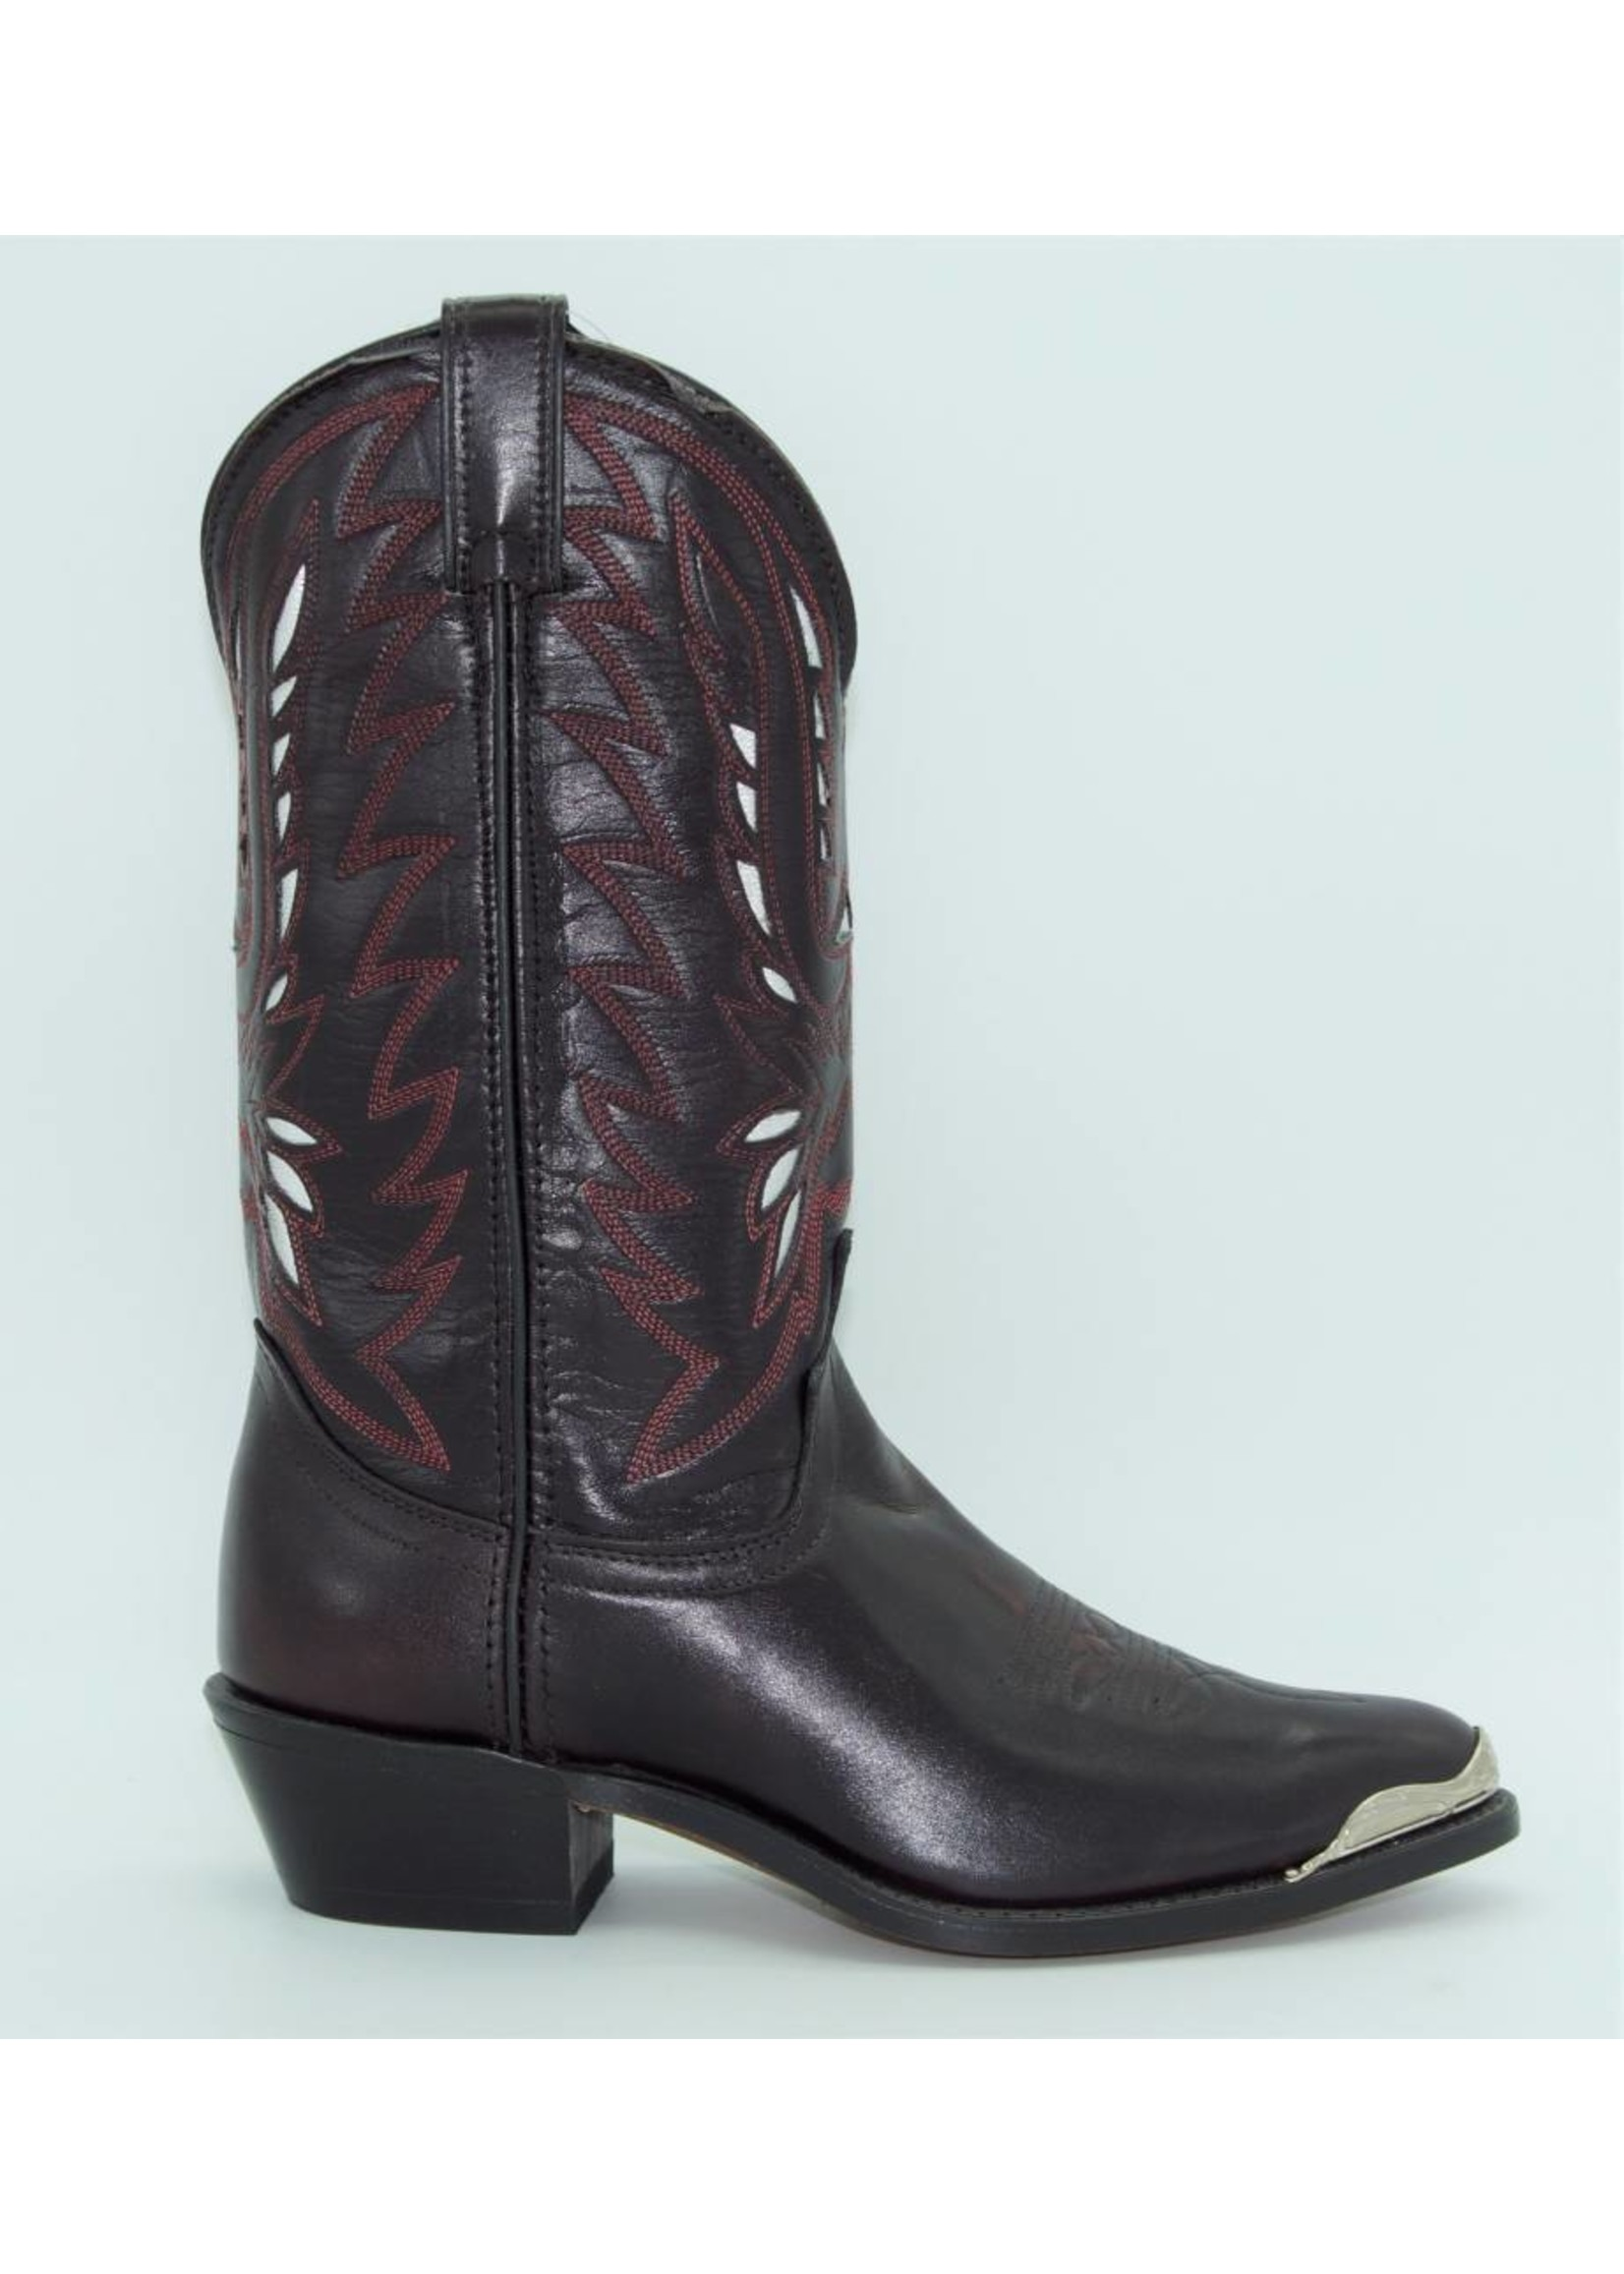 Laredo Laredo Men's Burgundy Western Boot 2793